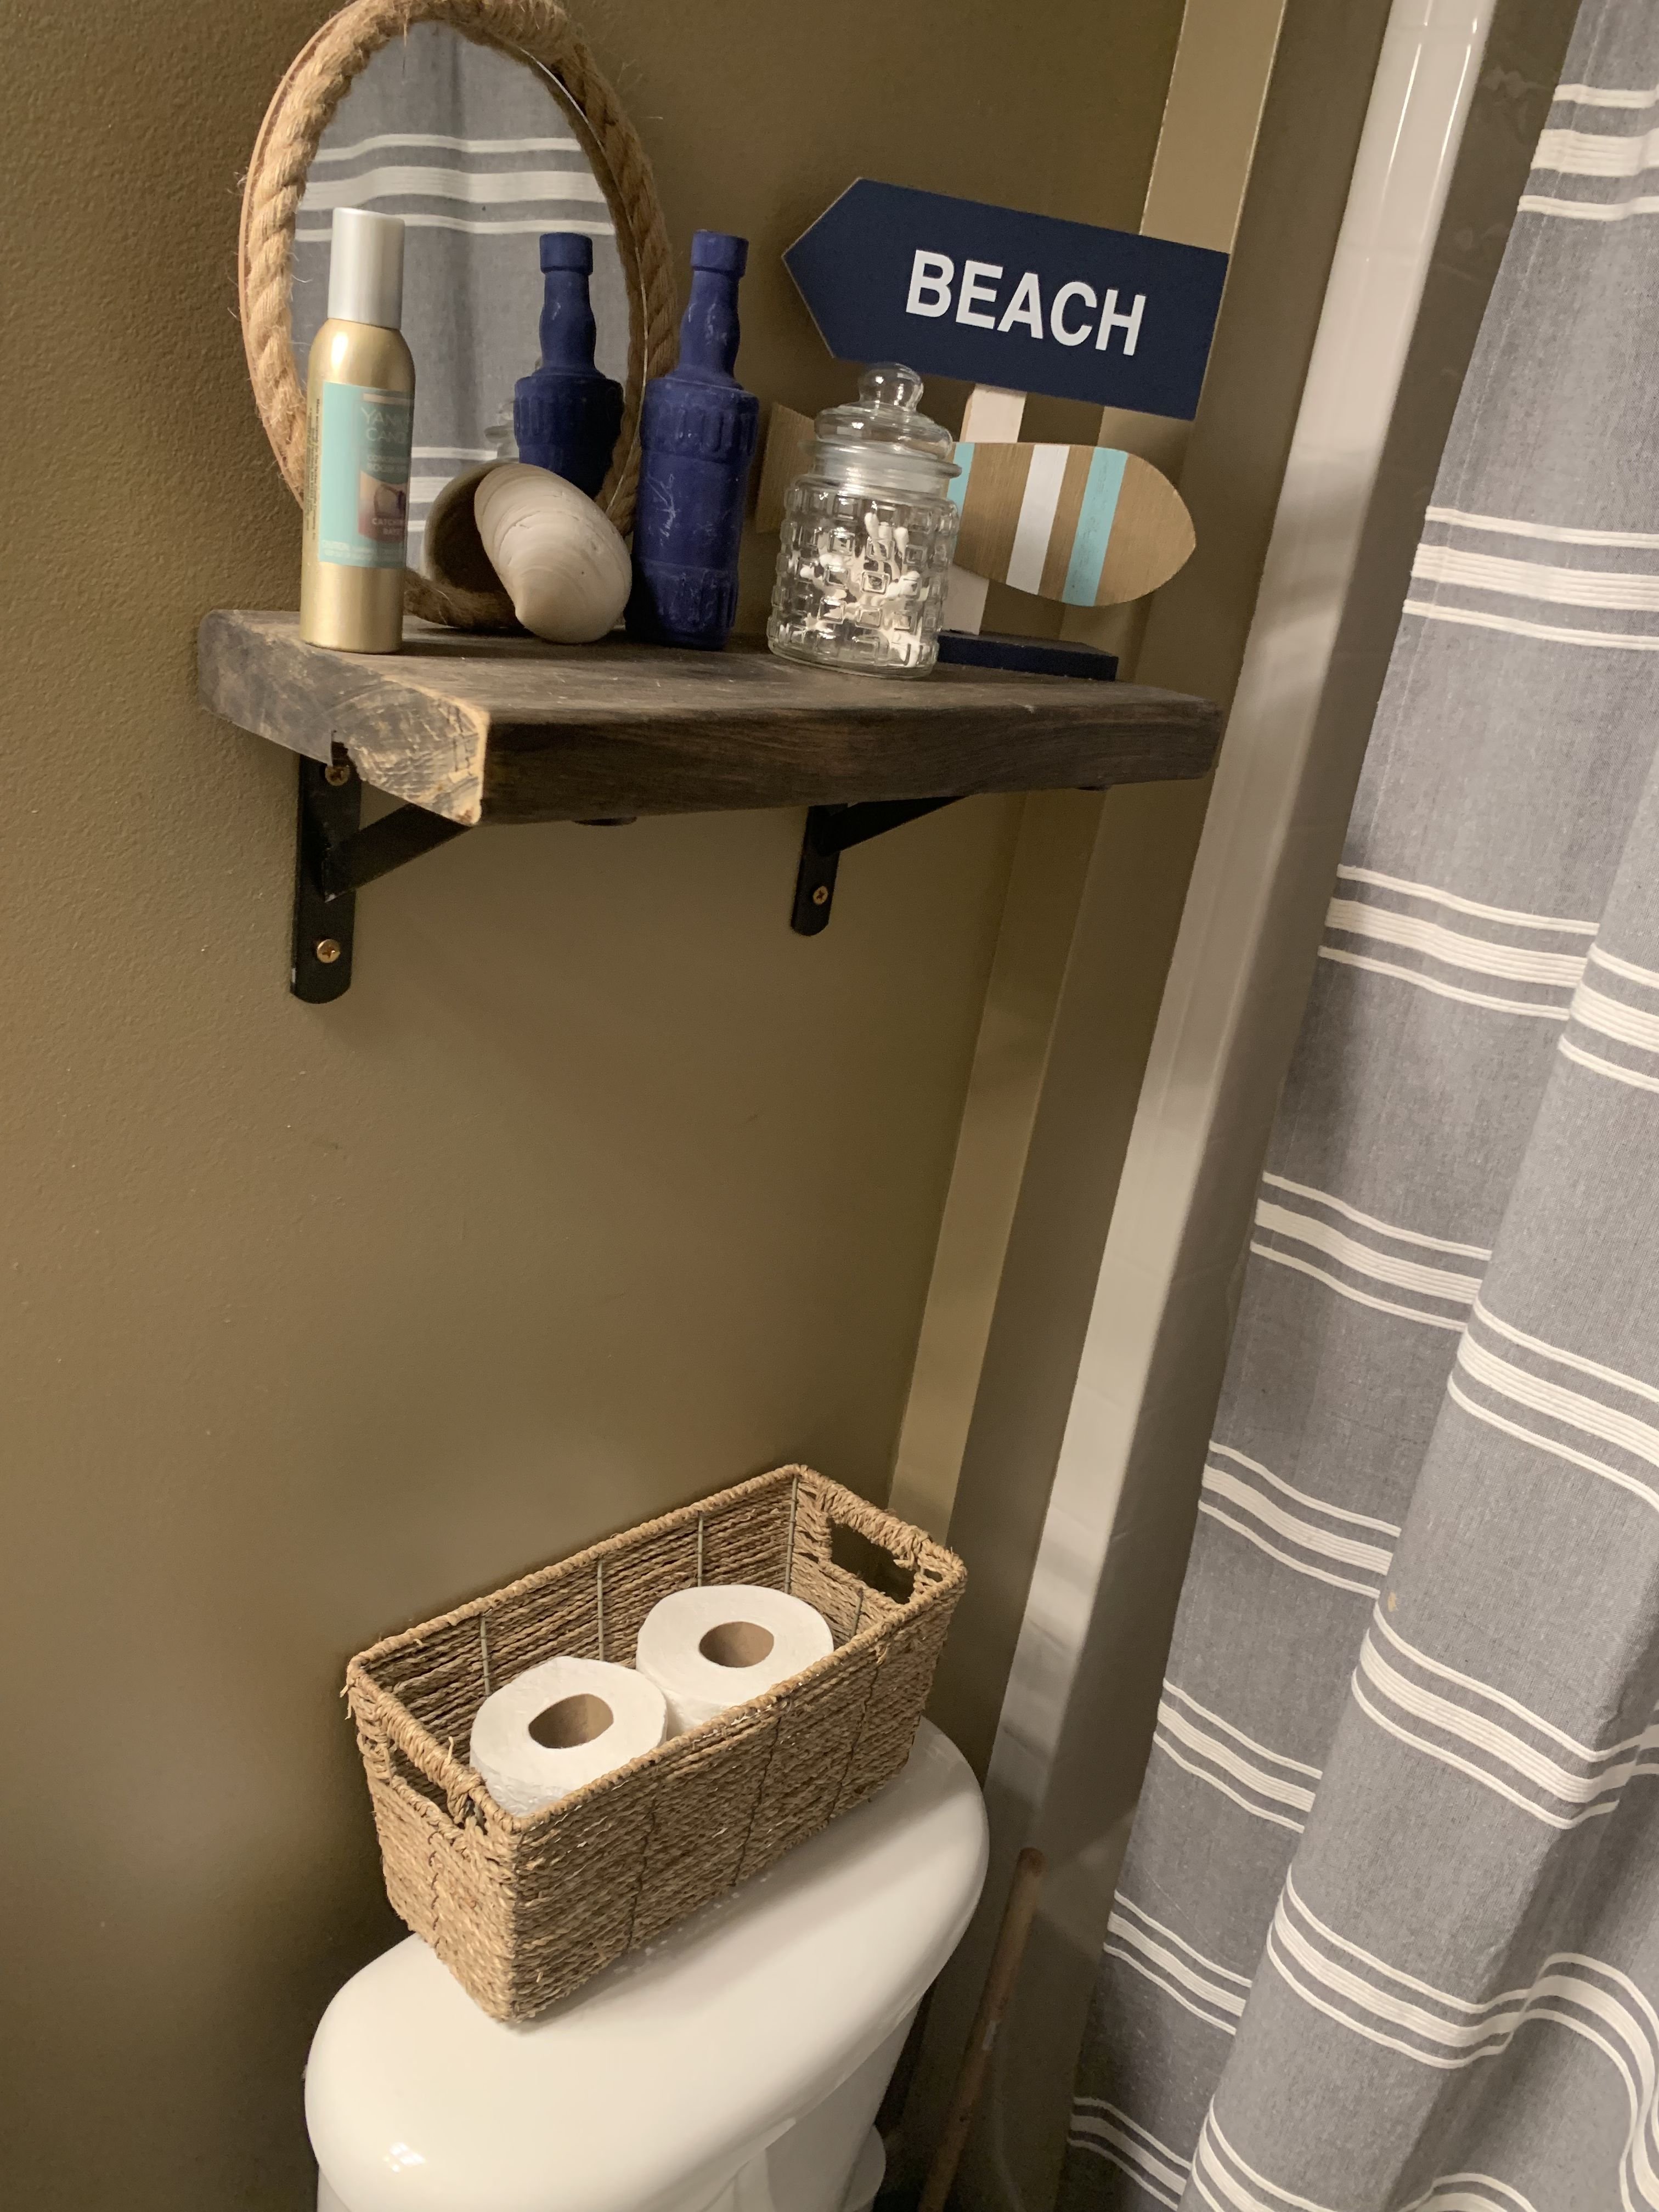 Driftwood Bathroom Shelf Driftwood Bathroom Bathroom Shelves Shelves